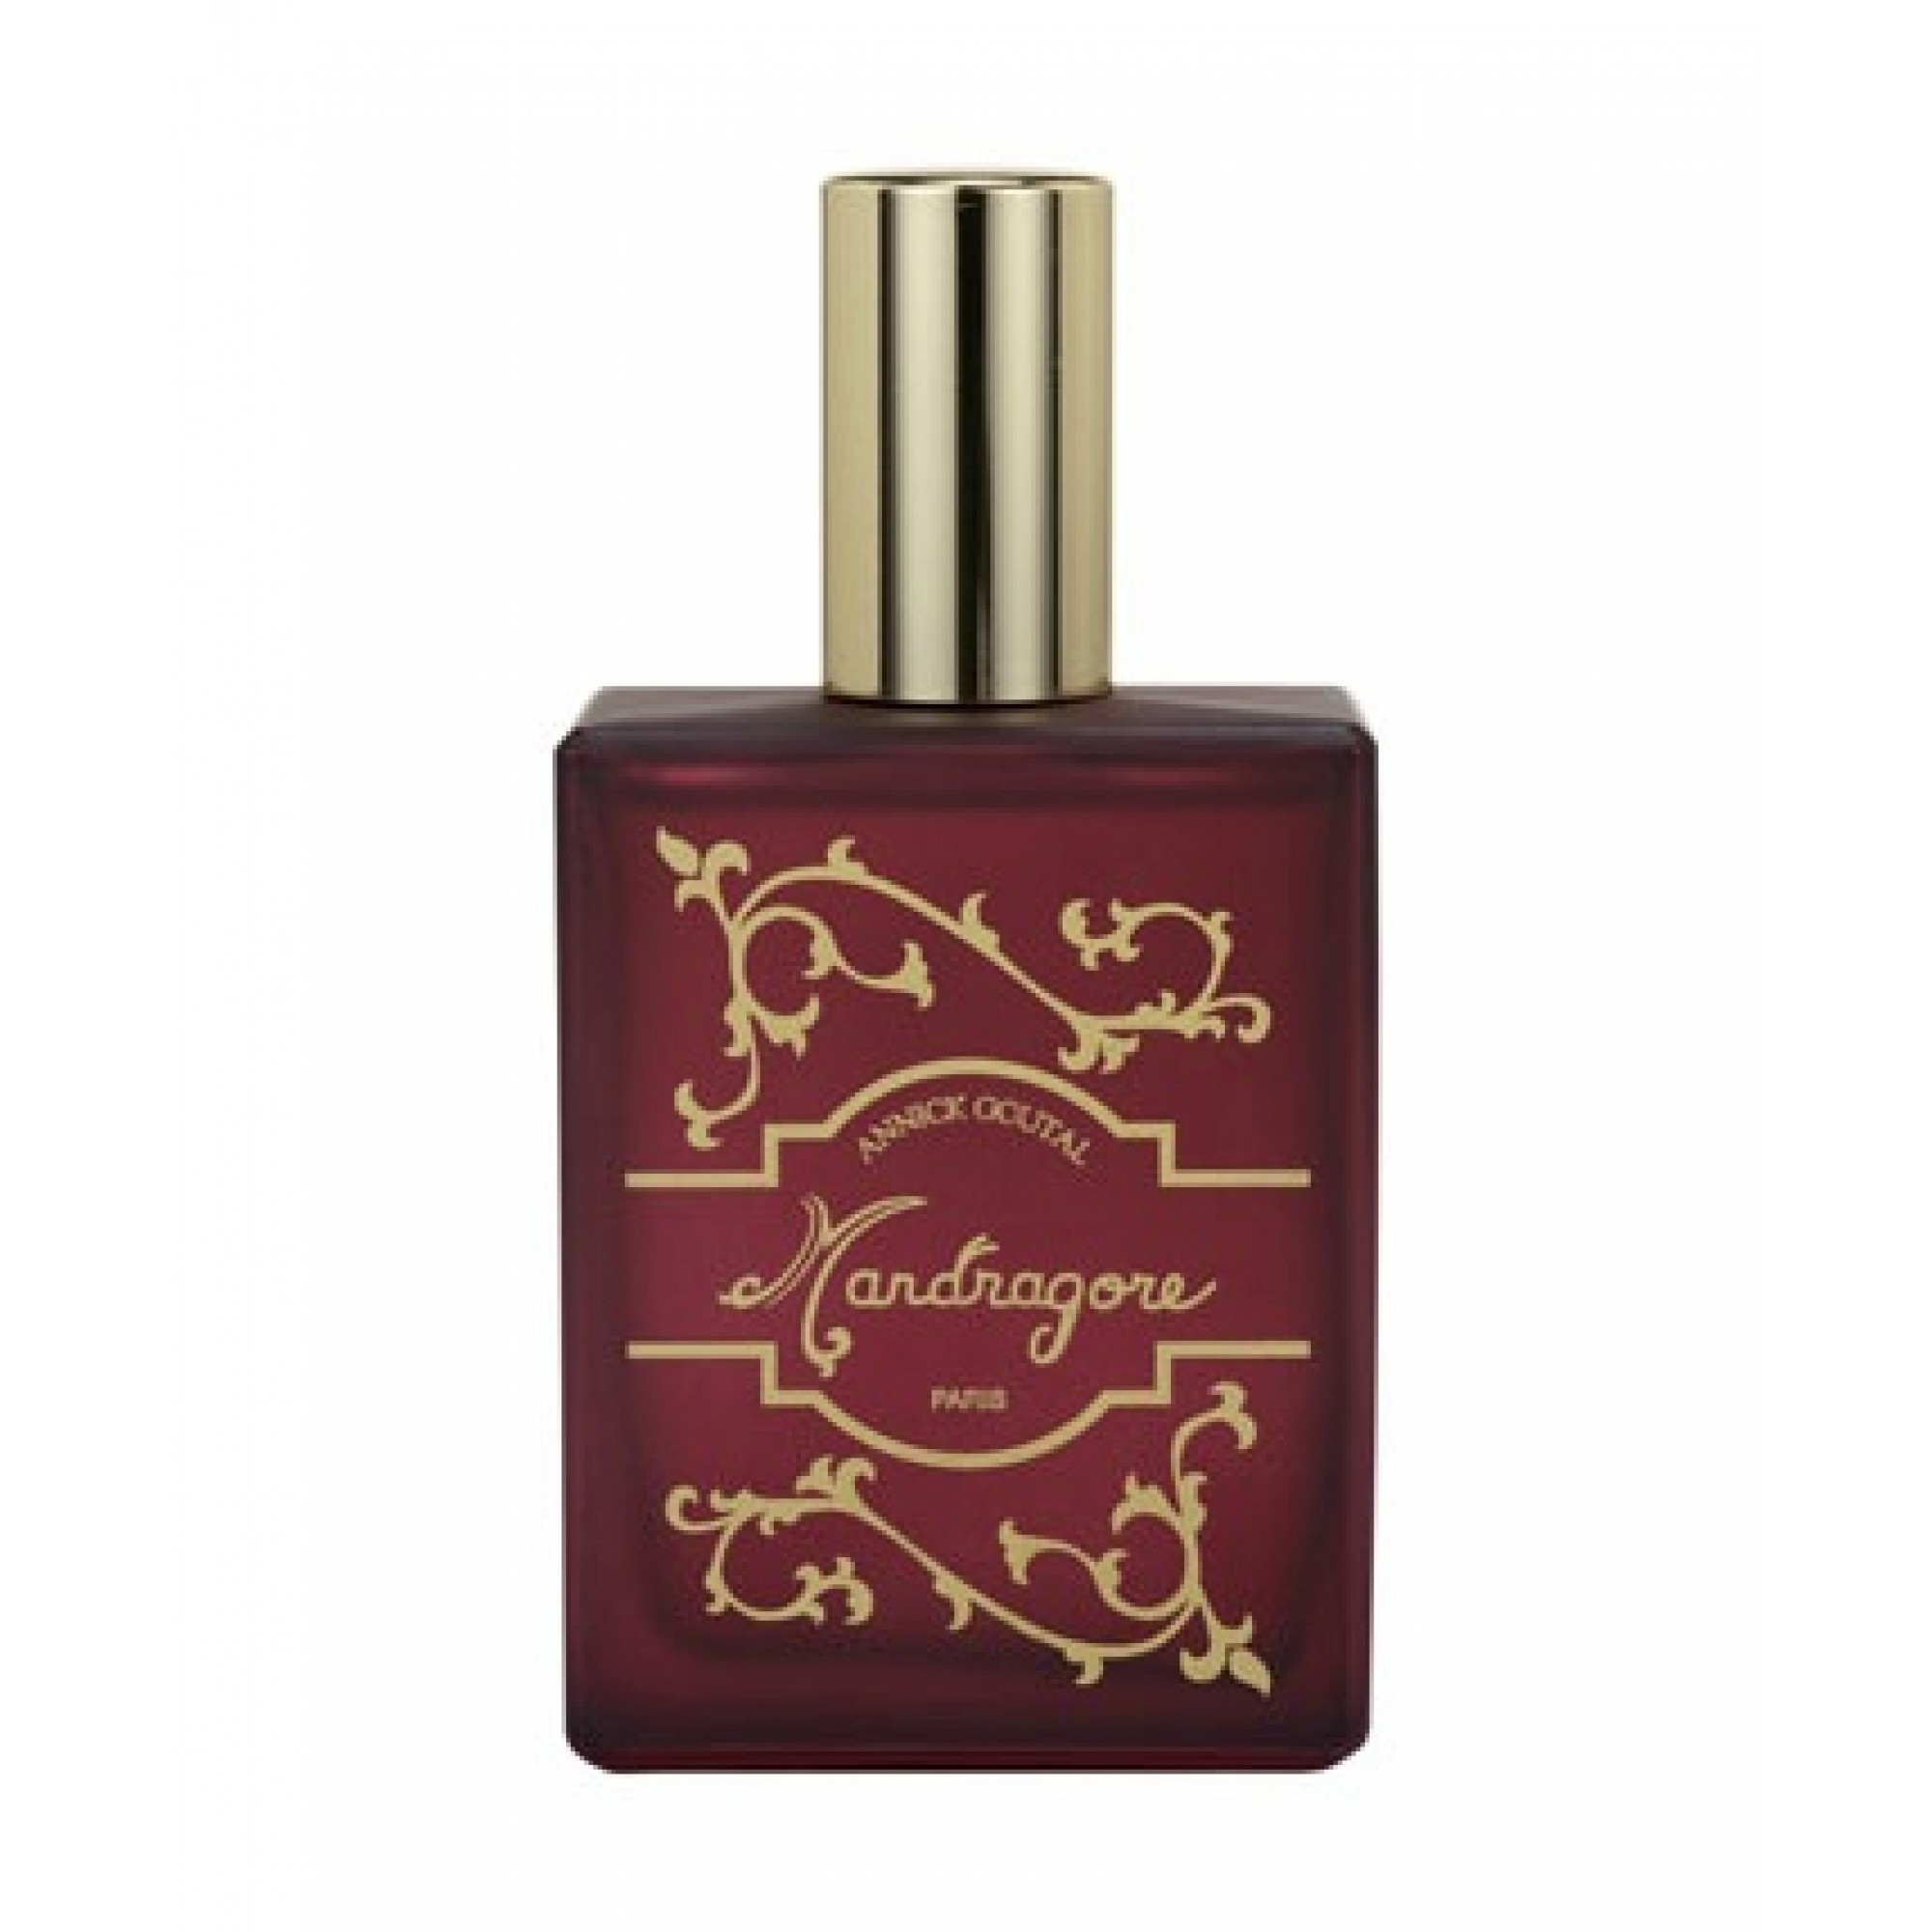 Goutal Mandragore аромат для мужчин и женщин